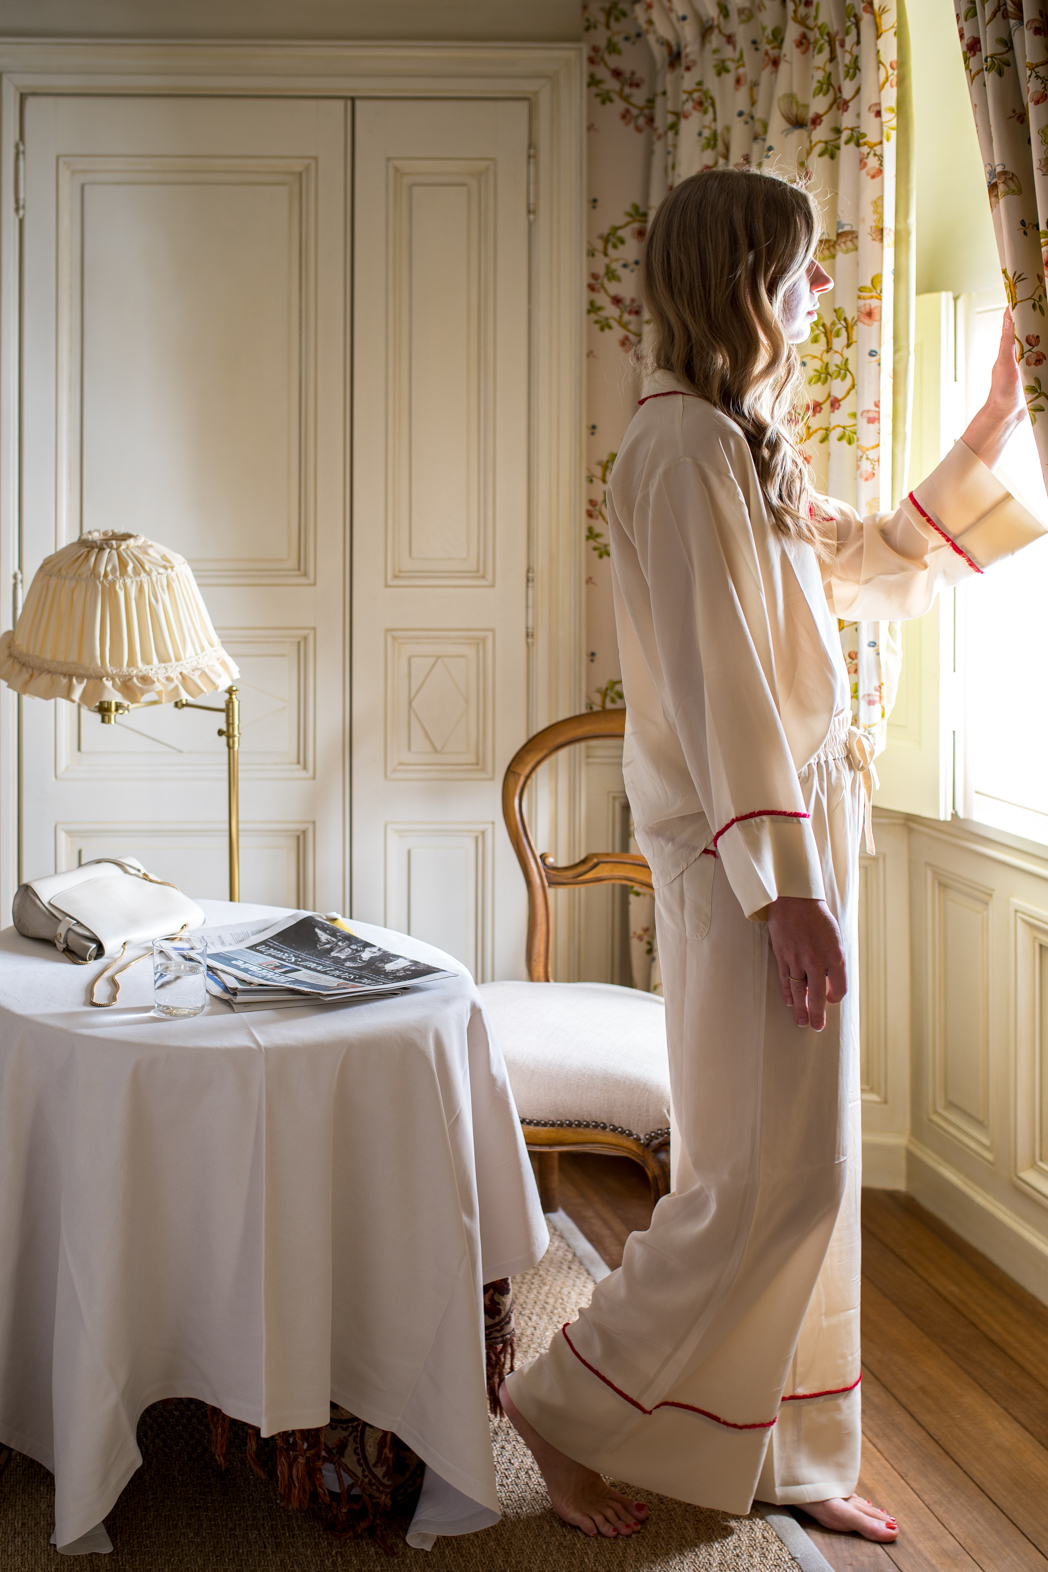 Stacie Flinner La Mirande Avignon-9.jpg